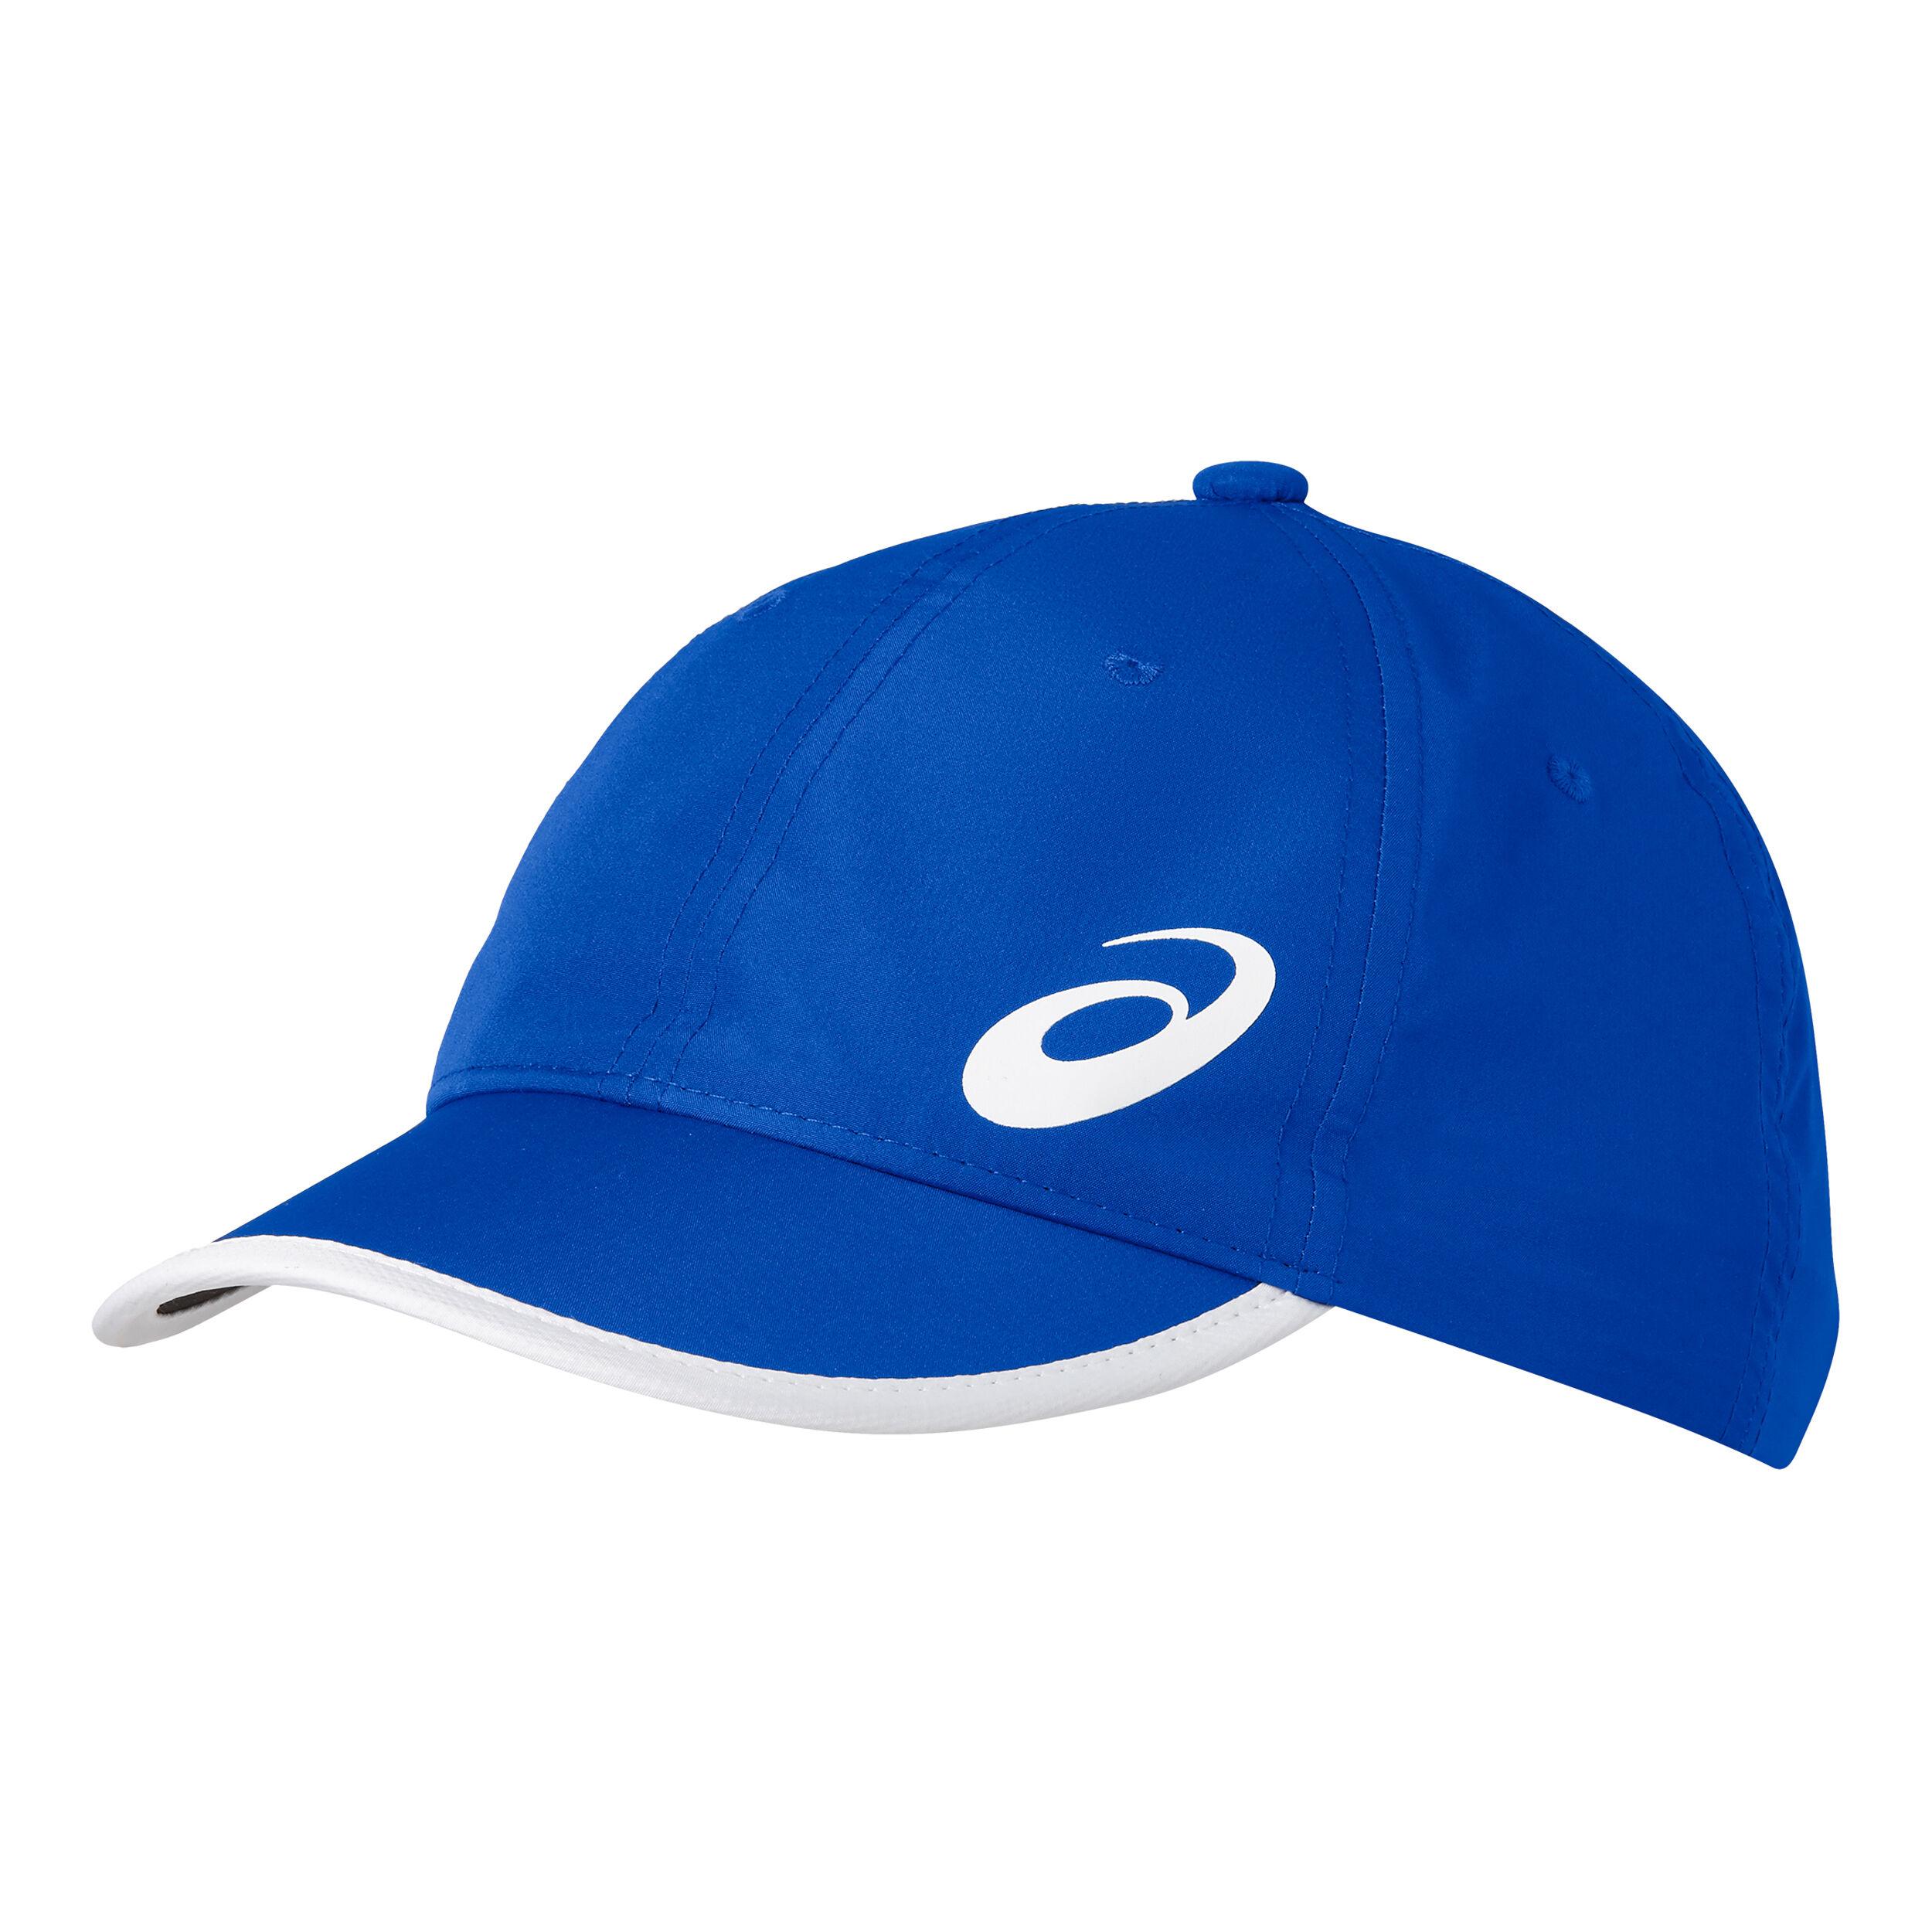 adidas Tennis Headband adidas Tennisbekleidung Stirnband